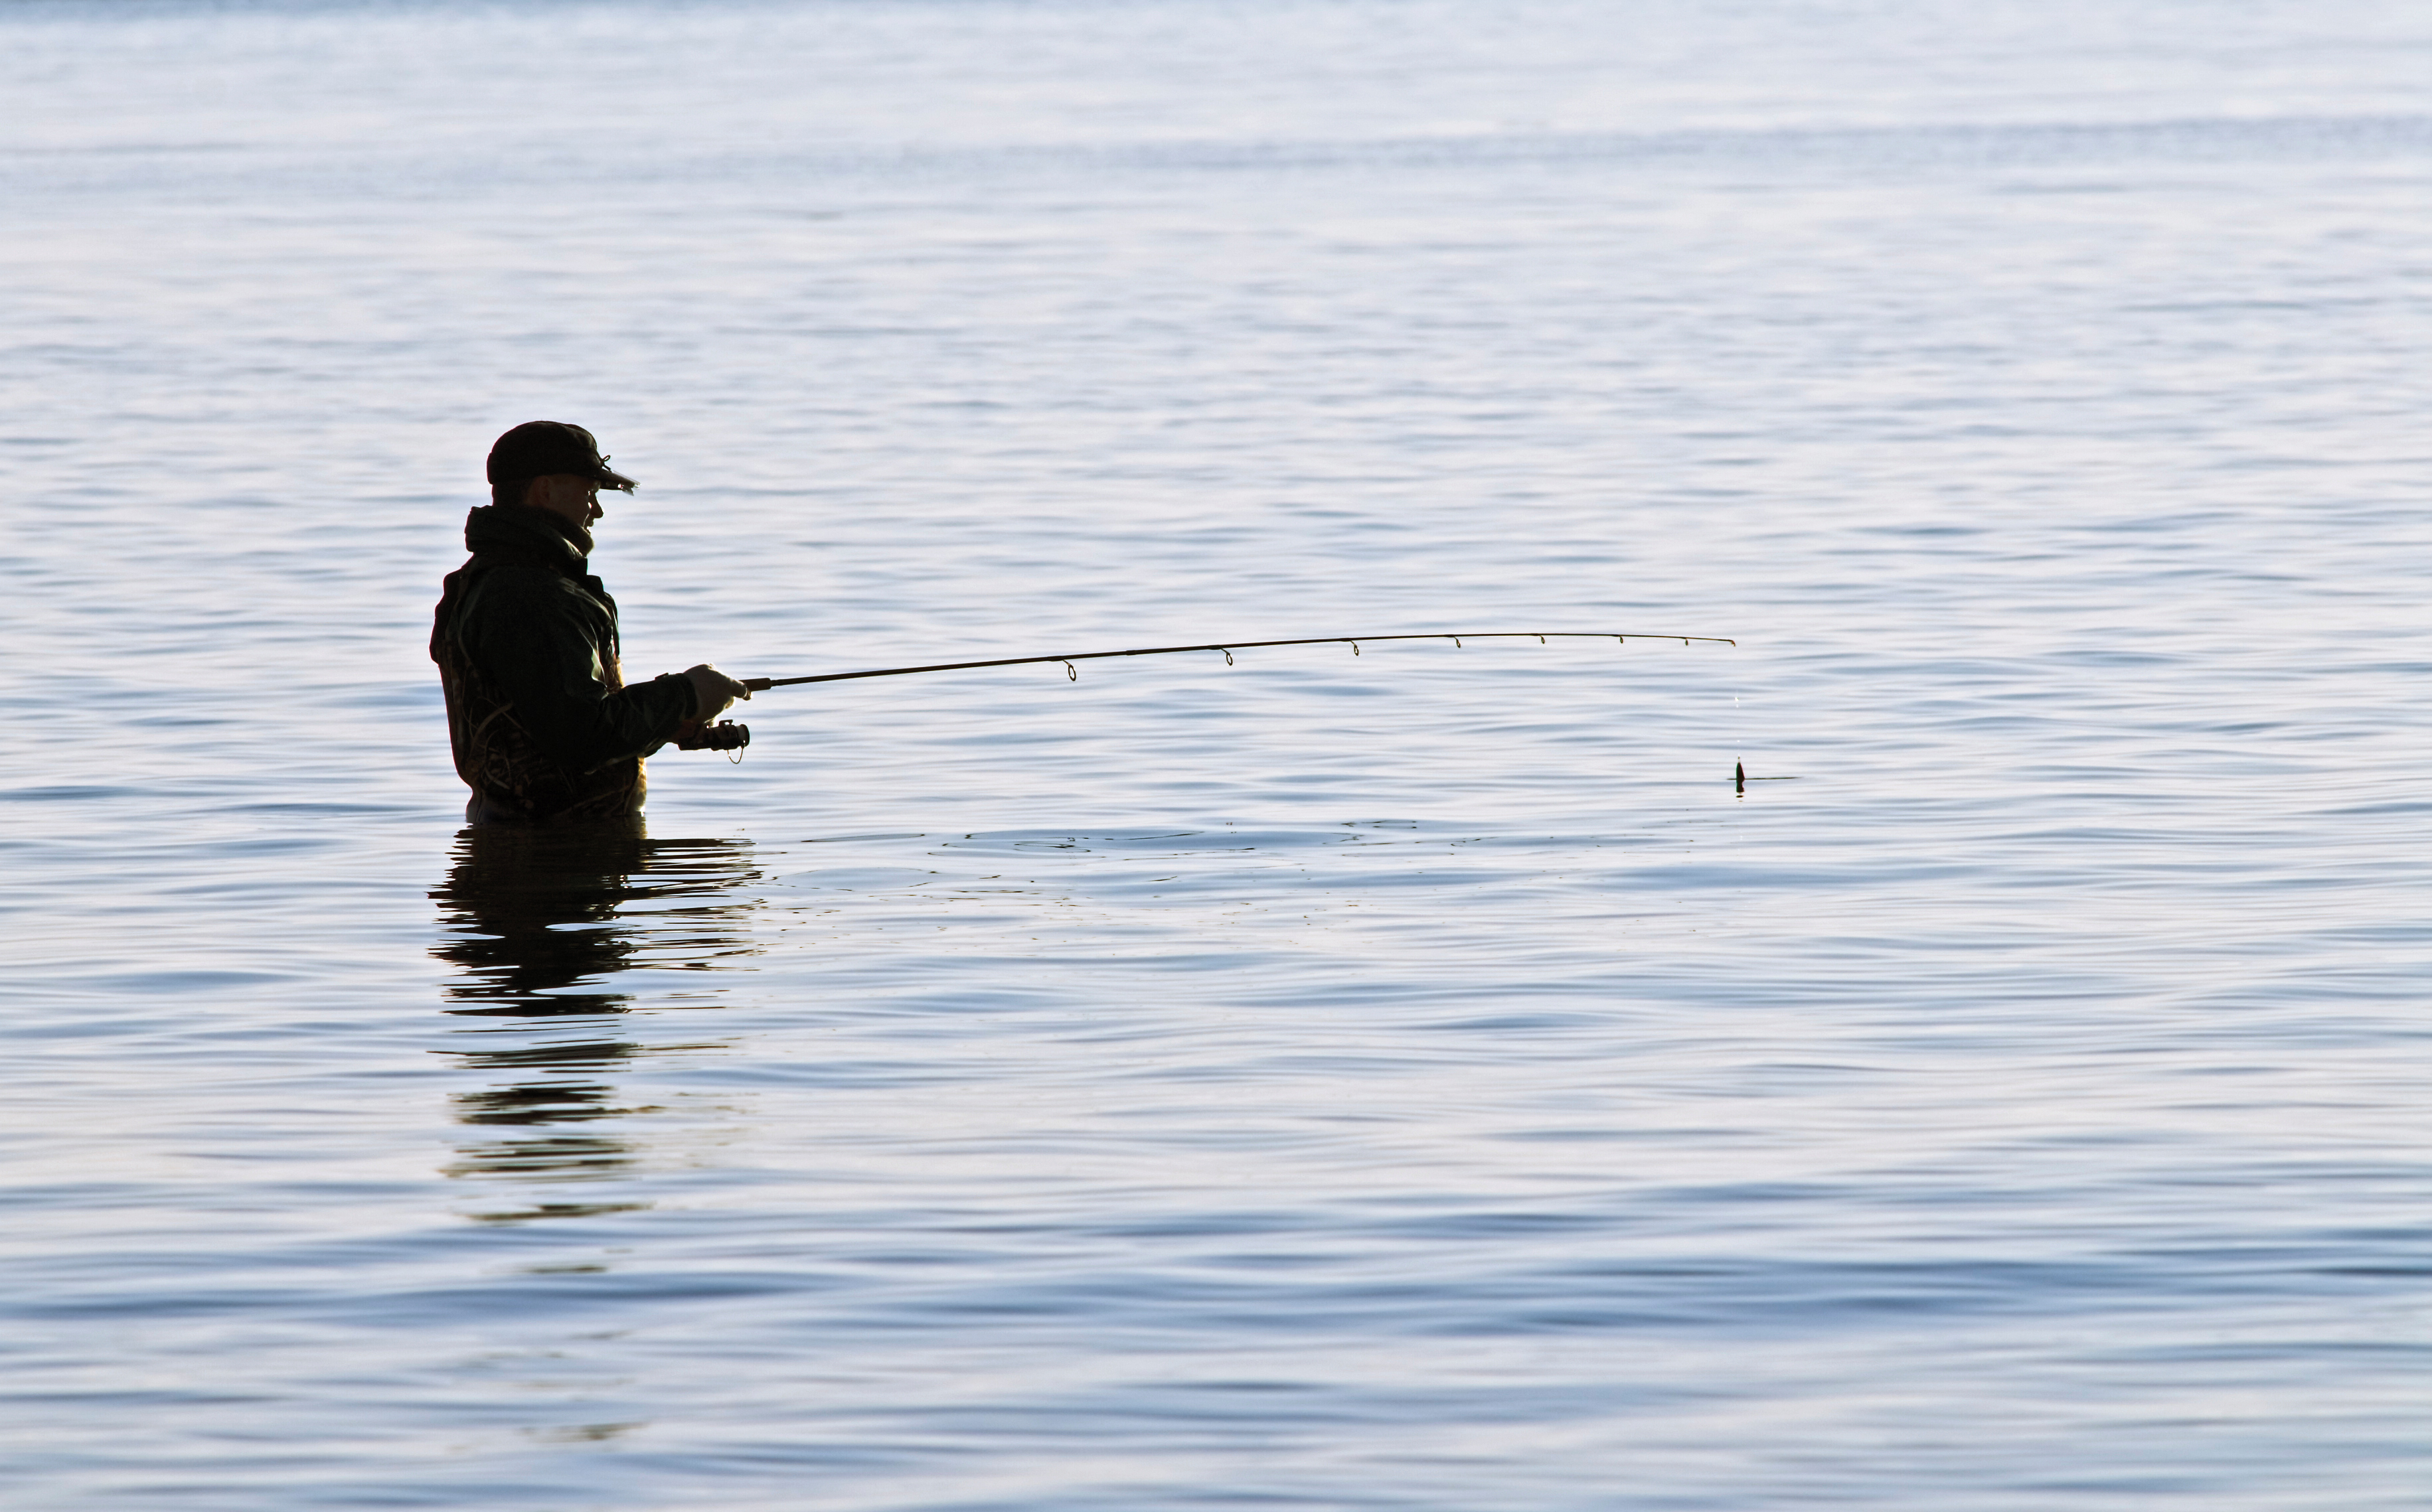 Wade fishing galveston bay archives gulf coast mariner for Wade fishing gear